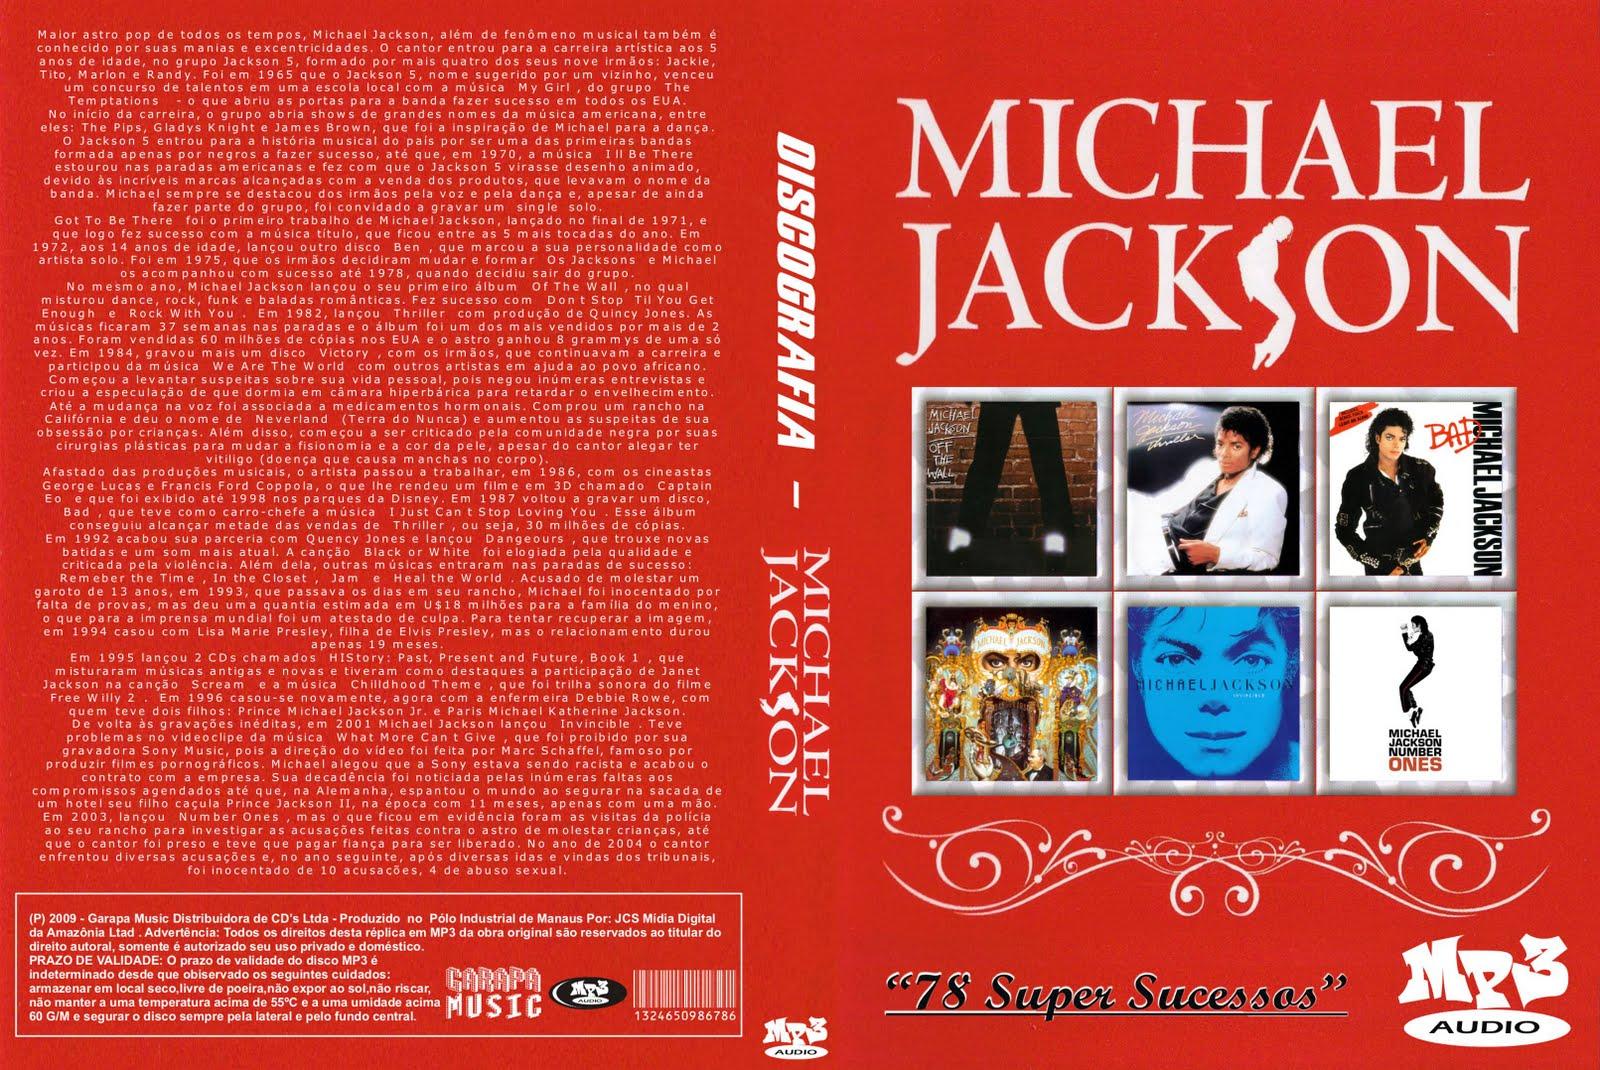 Michael Jackson music - Listen Free on Jango